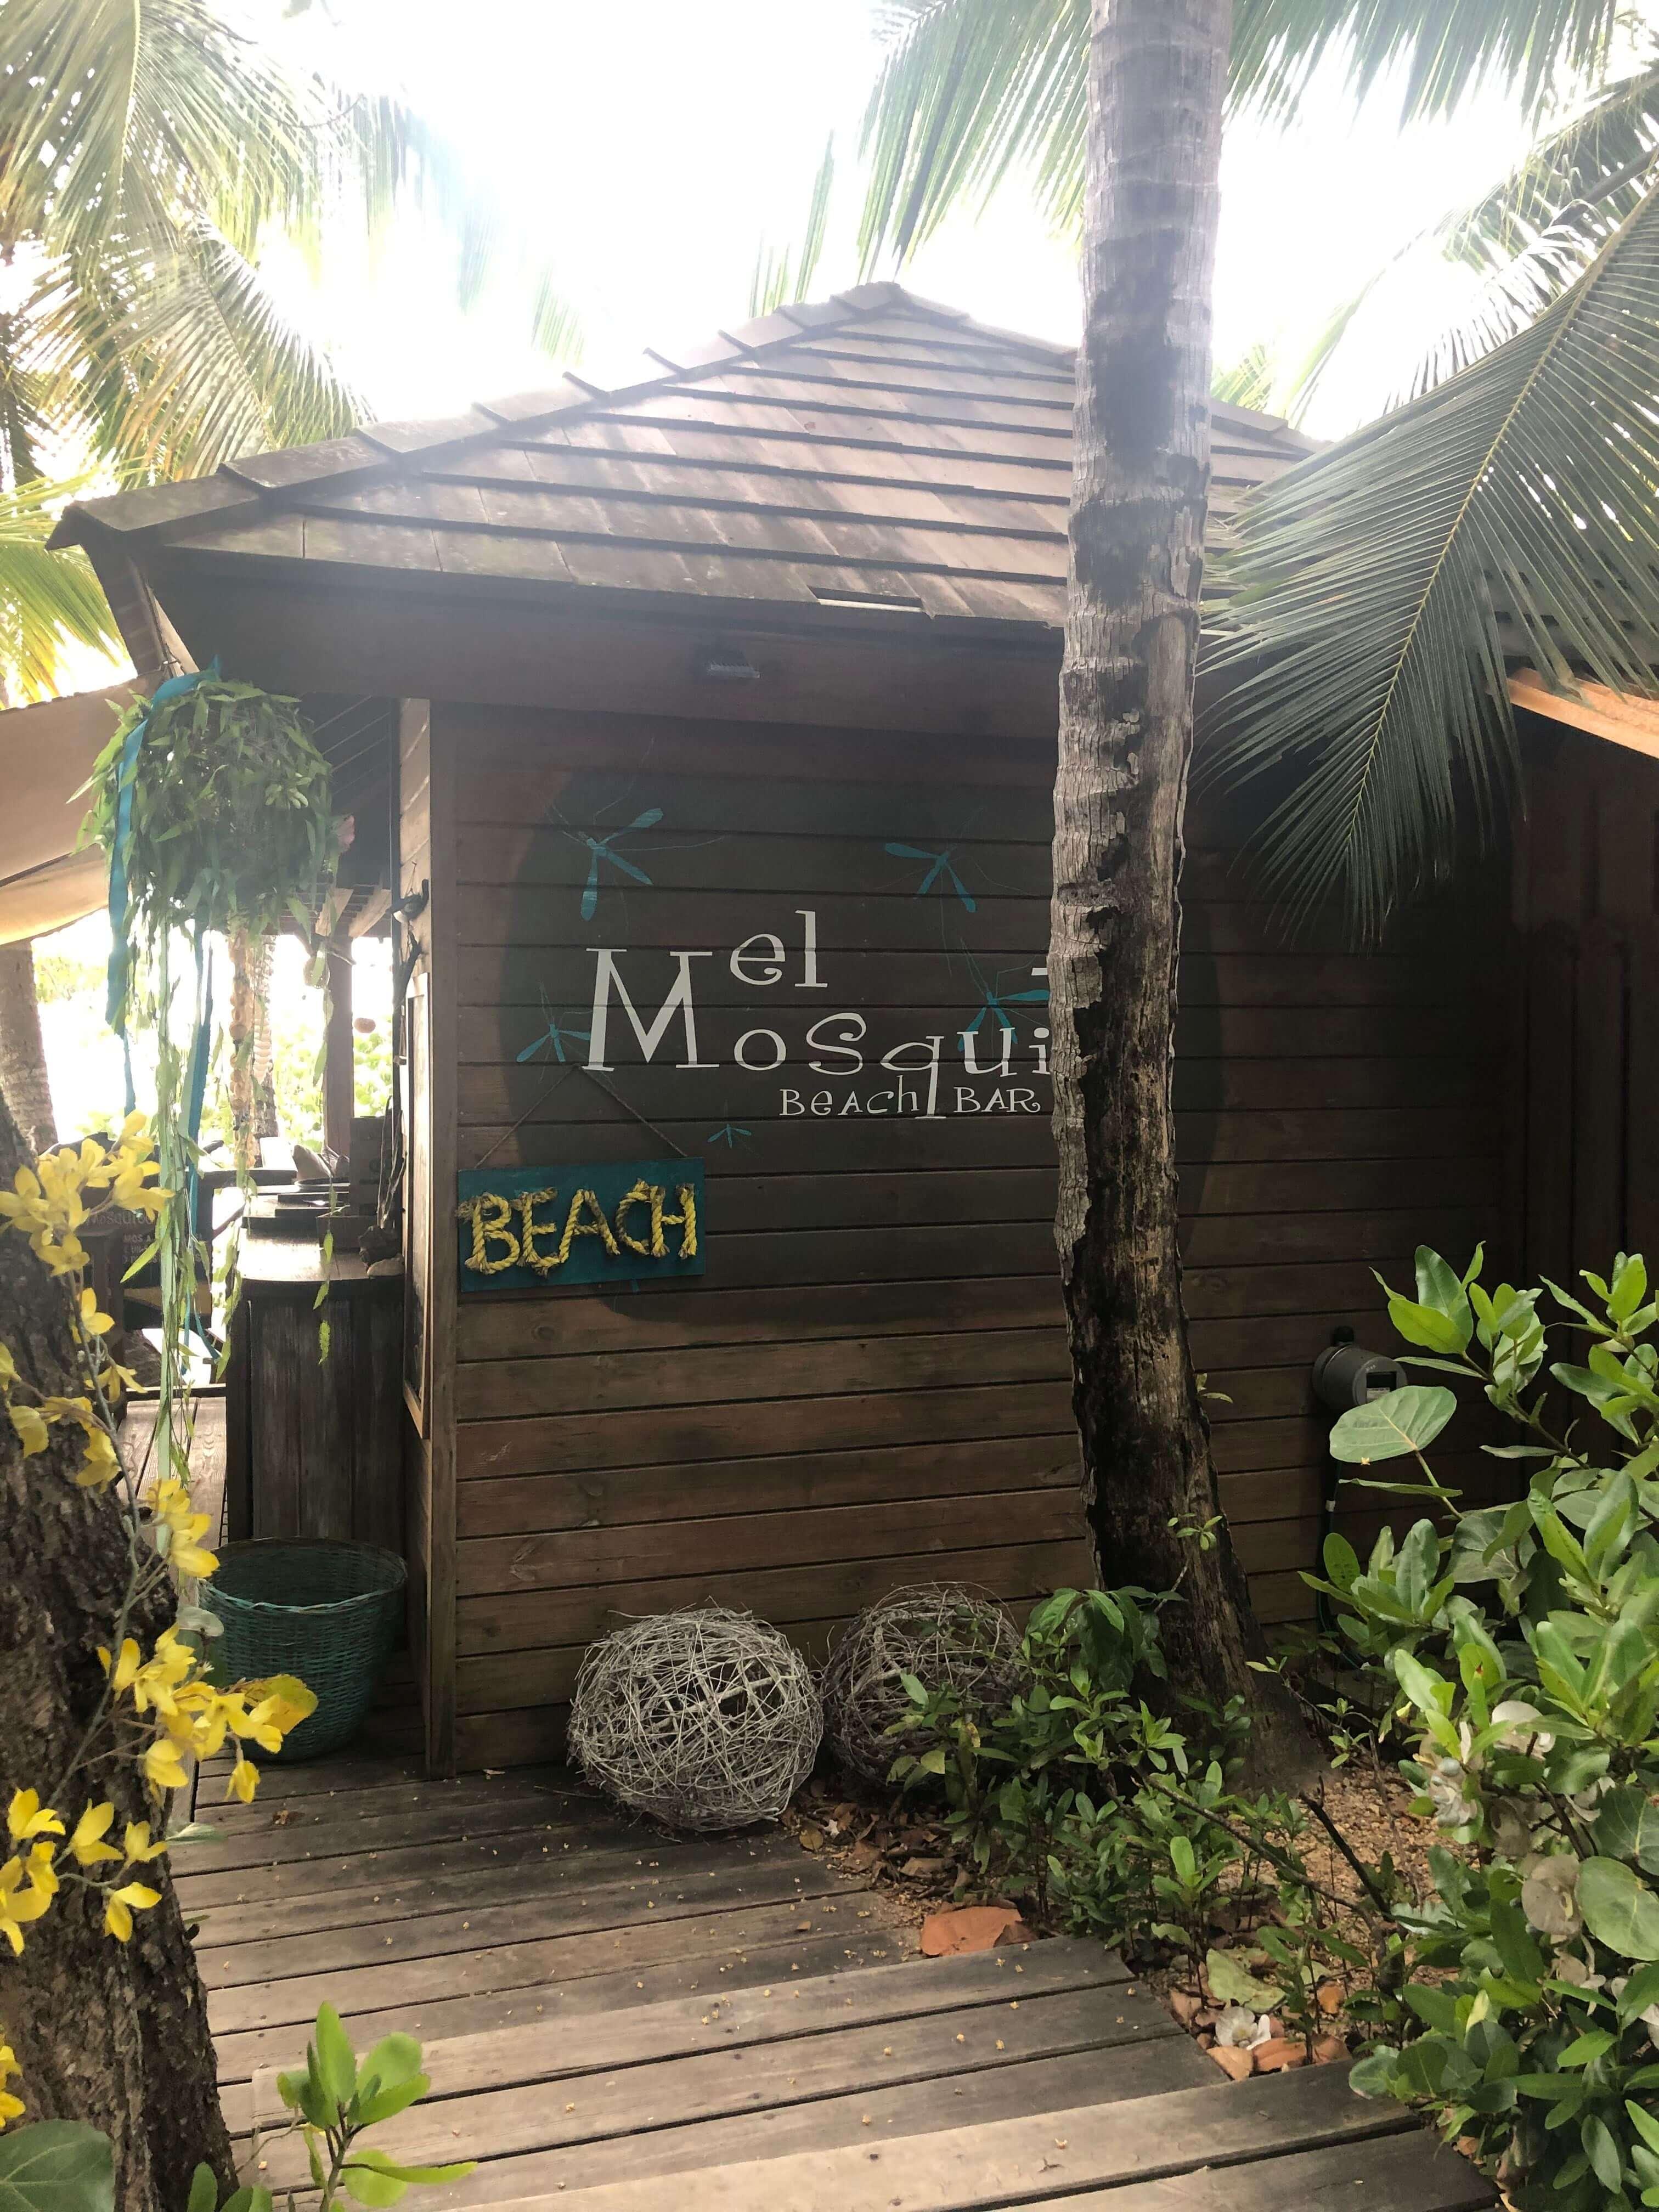 El Mosquito Beach Bar